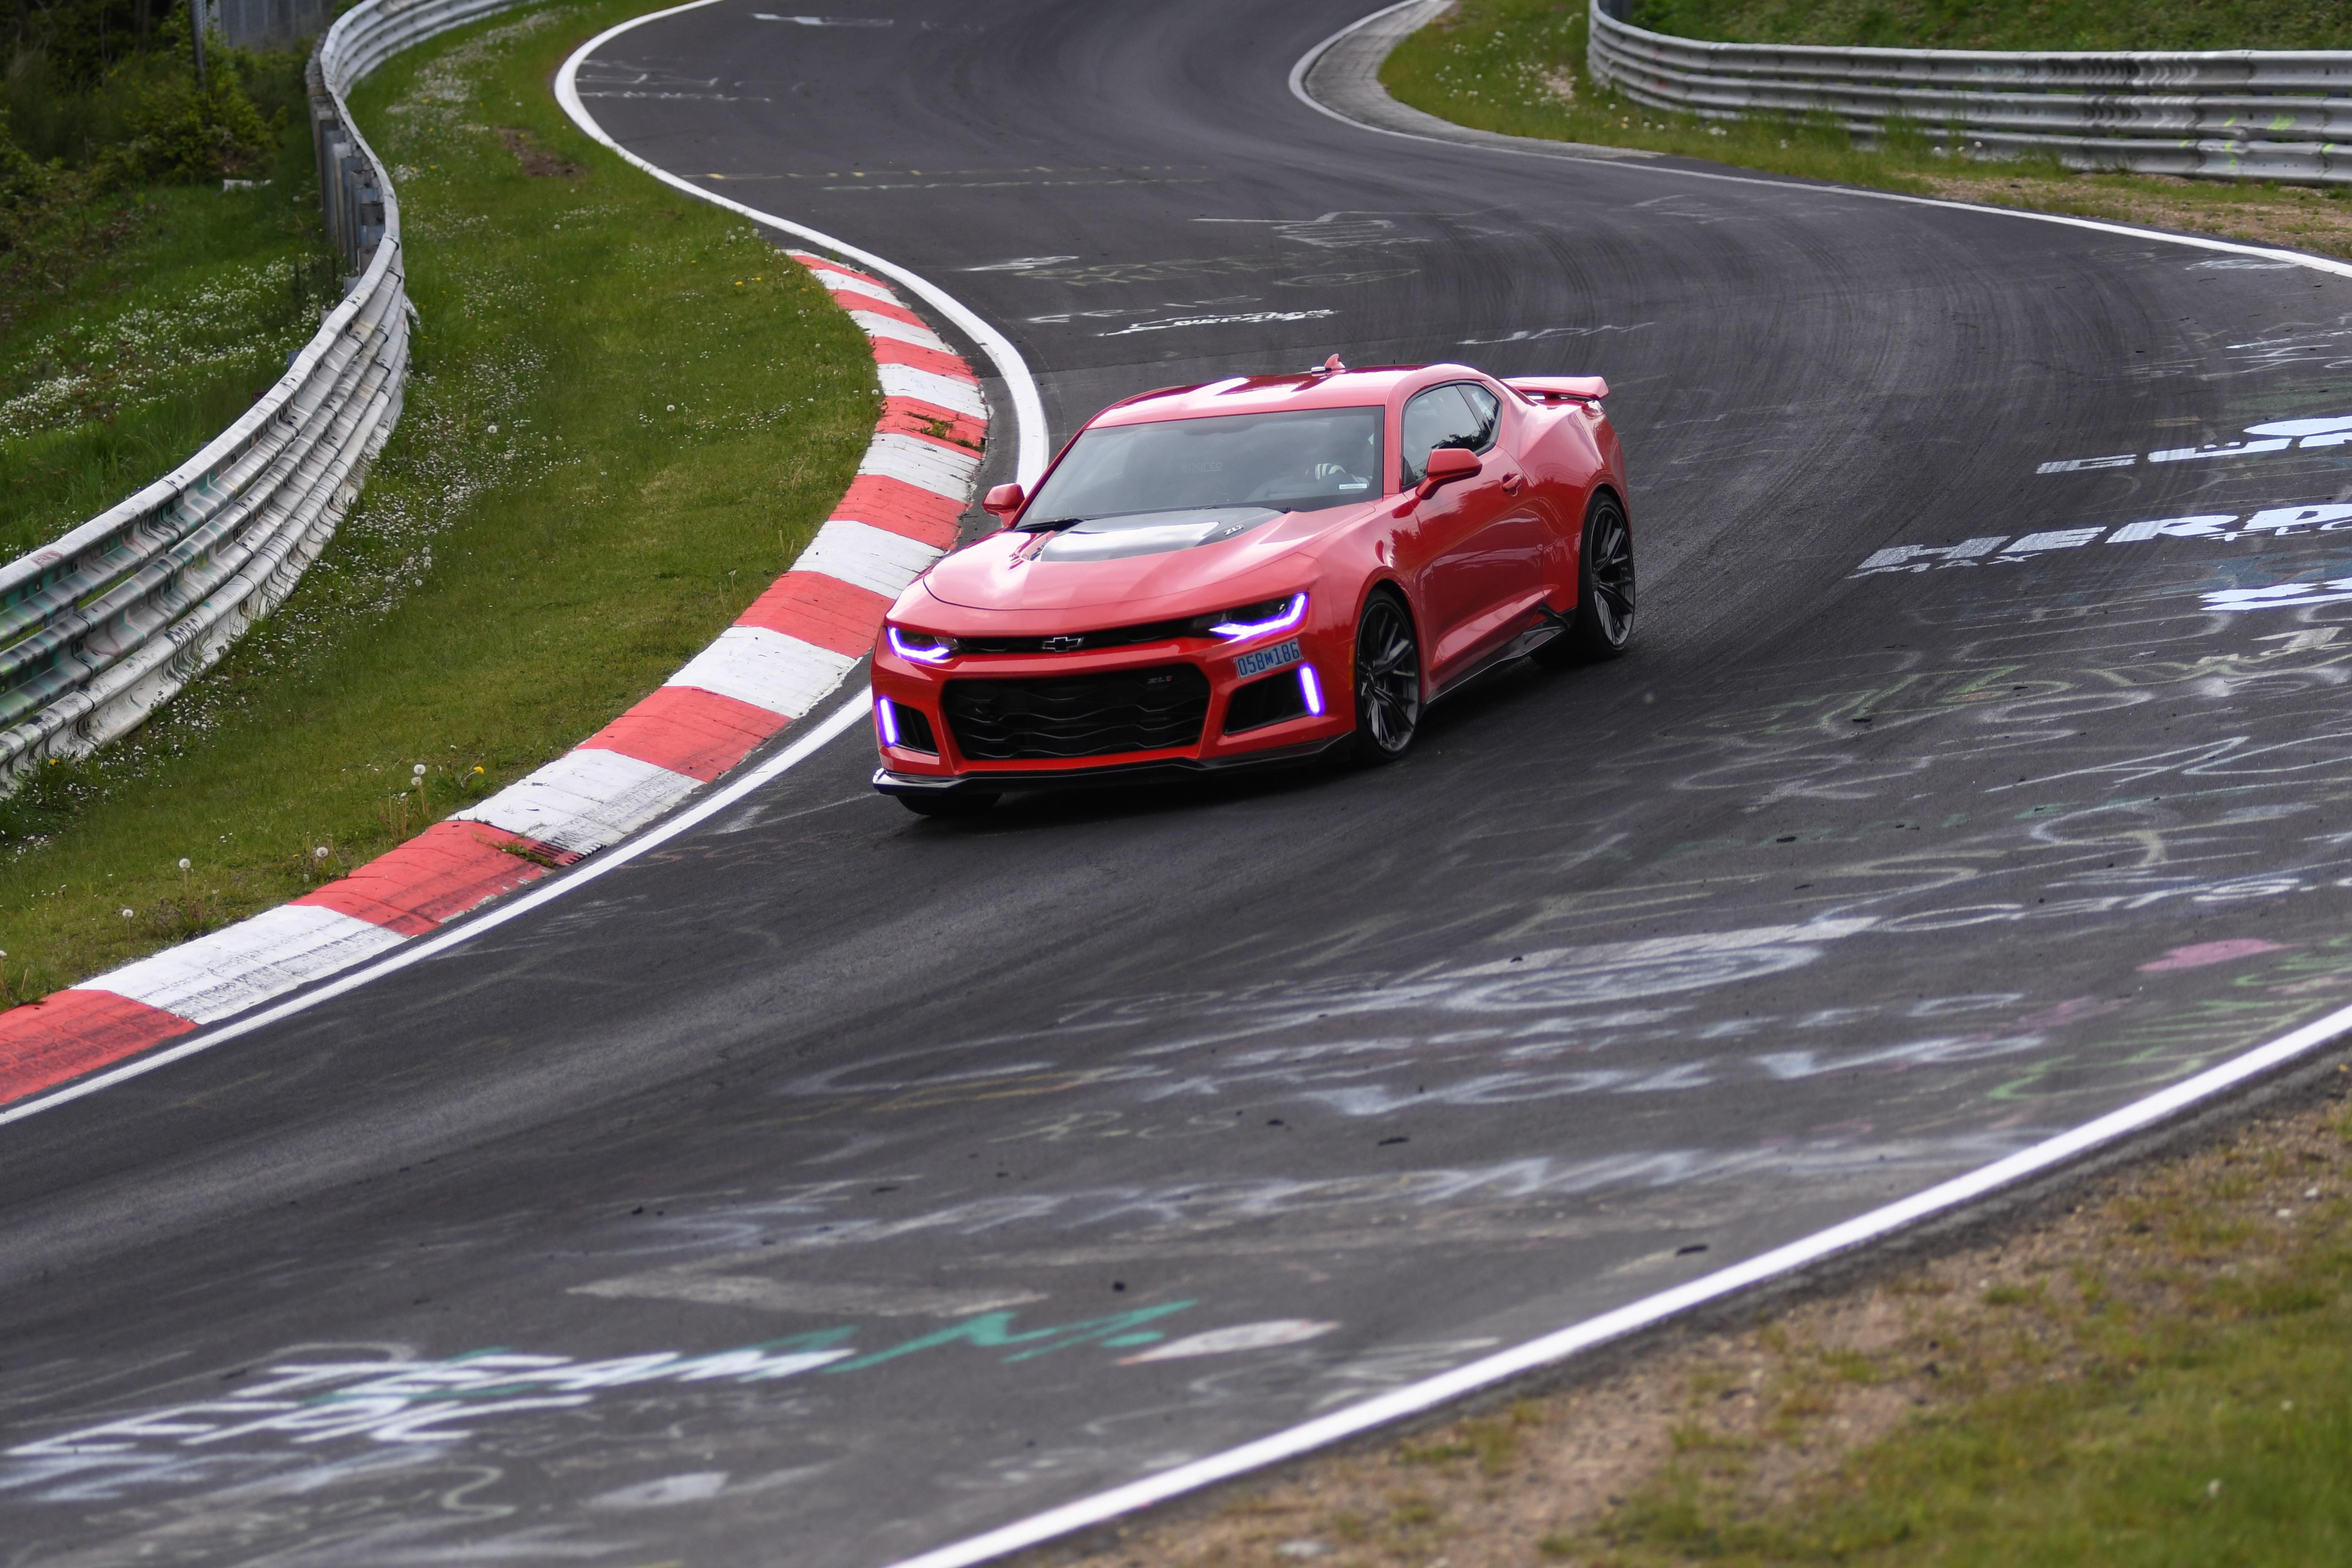 Chevrolet 2017 Camaro ZL1 lapped Germany's grueling Nürburgring